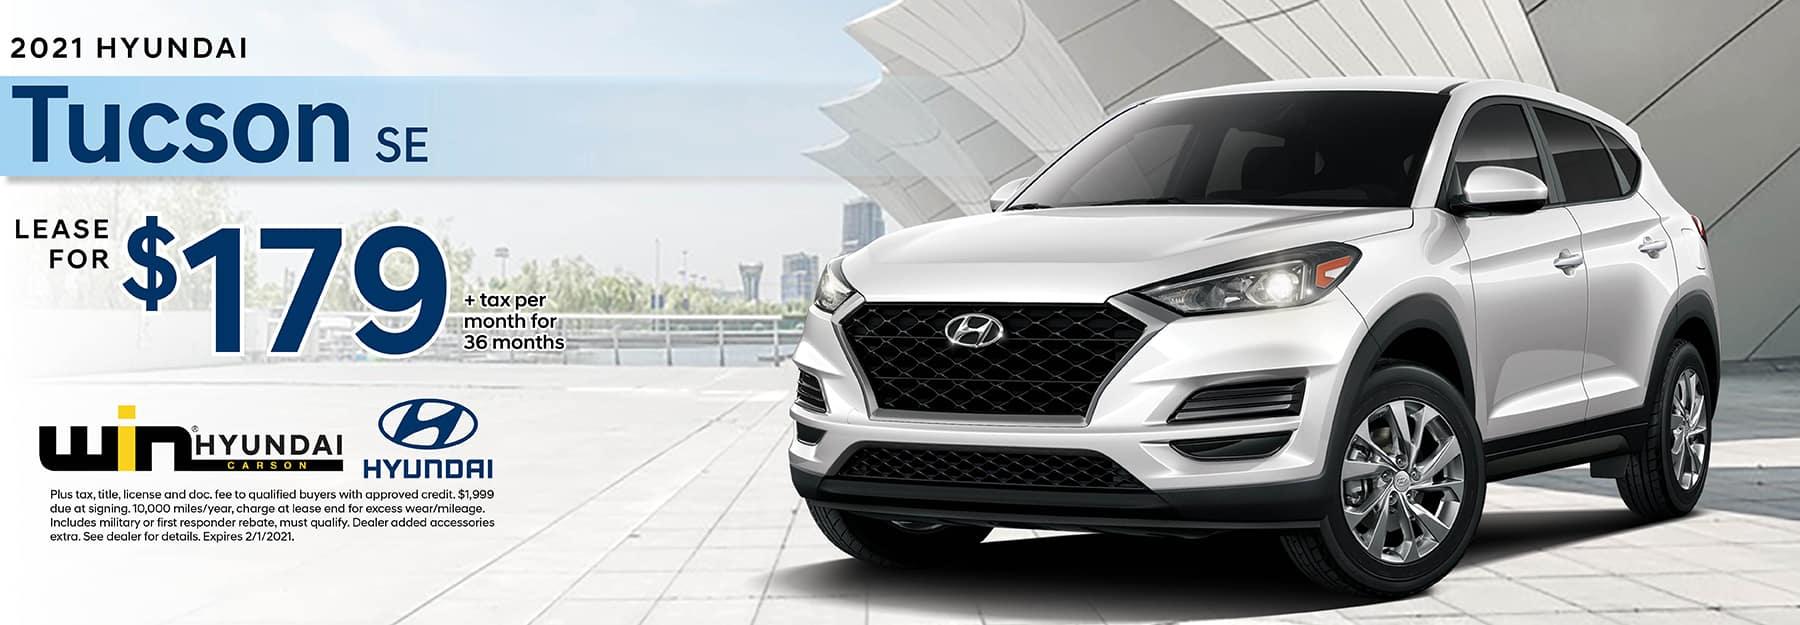 2021 Hyundai Tucson SE Lease for $199 | Carson, CA